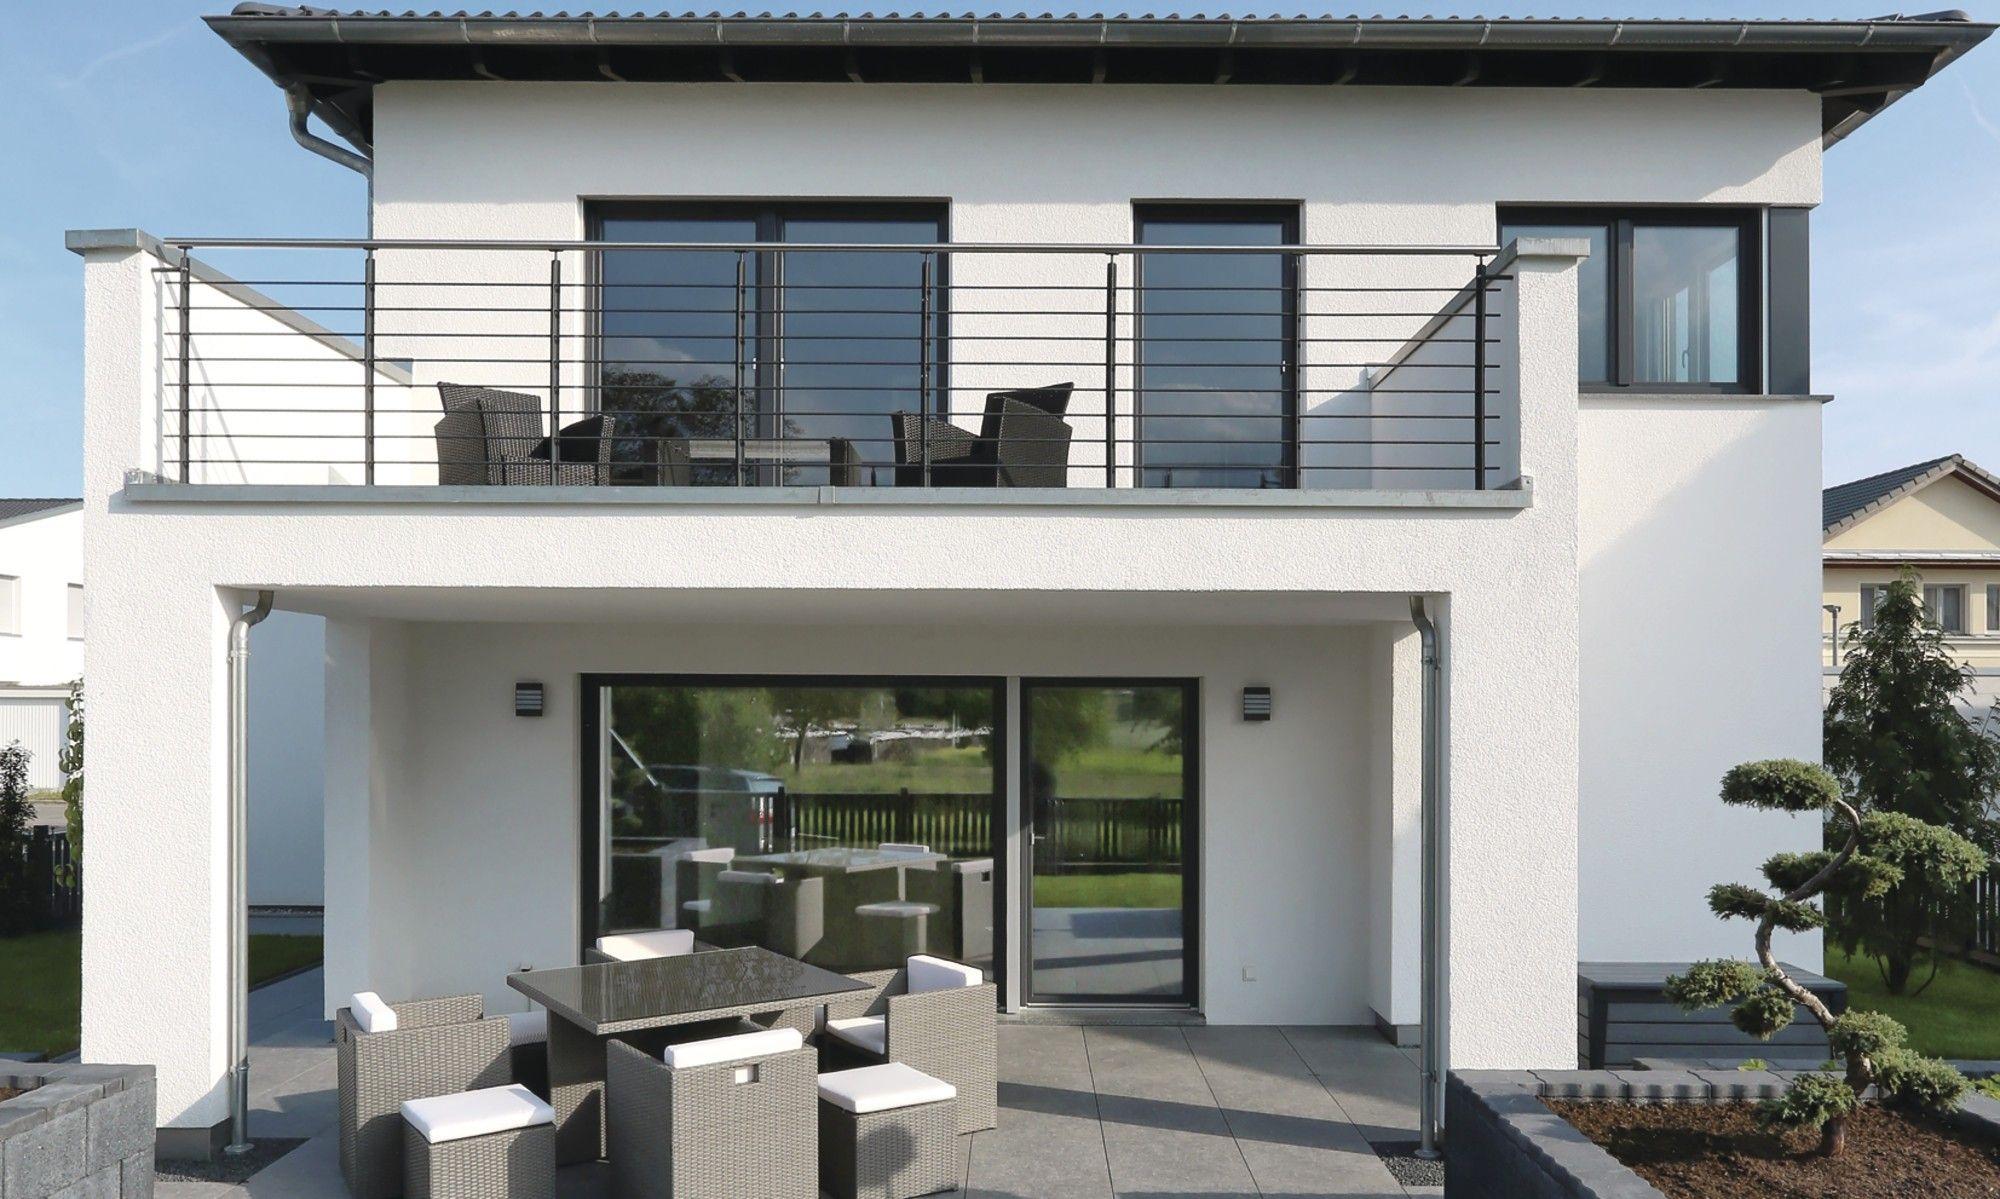 Fertighaus villa mit pool  Fertighaus #weberhaus #Bodensee #pool #Jacuzzi #garten #stadtvilla ...